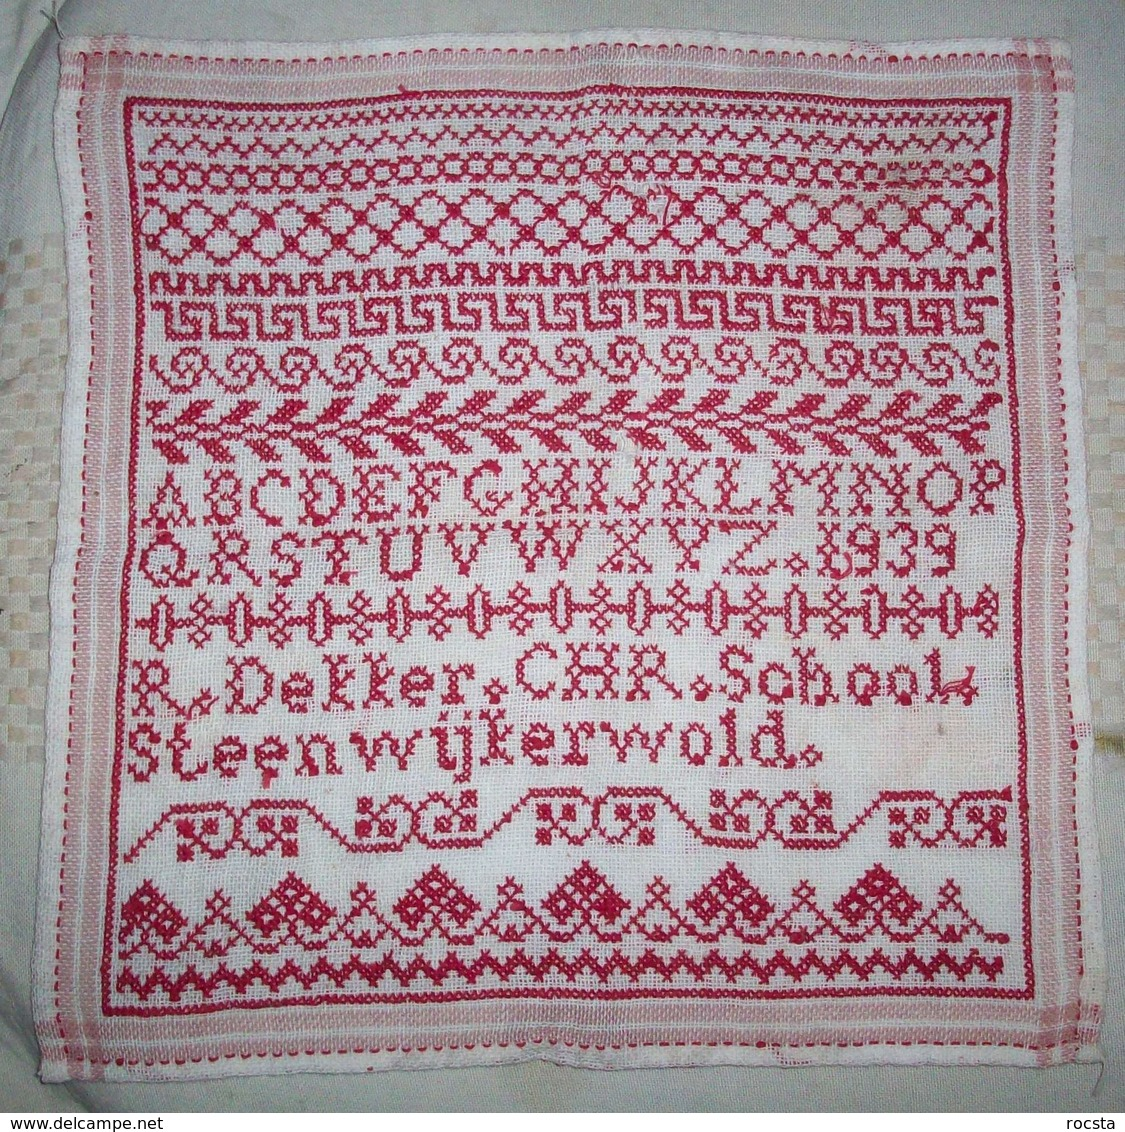 Antique Needlework Napkin R.Dekker CHR School Steenwijkerwold (1939 Dated) - Altre Collezioni